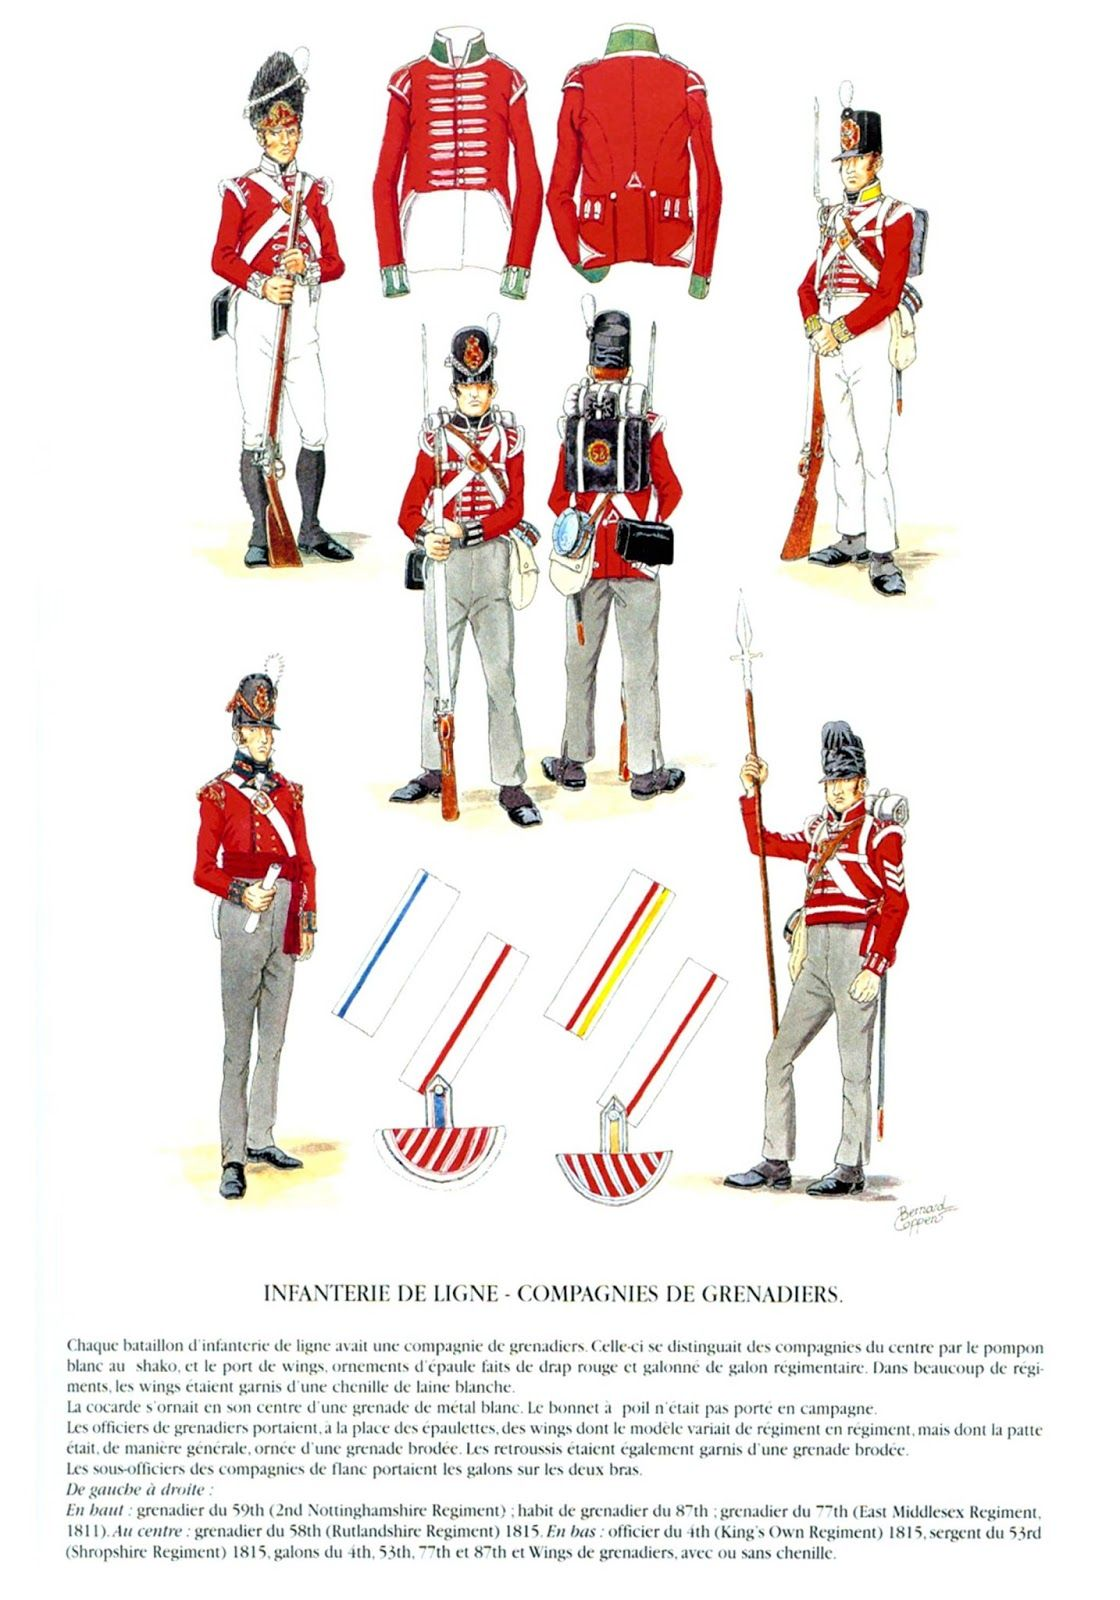 Militares Redcoats 1820 1800 Británicos Rojas Casacas Uniformes dOqgZ4